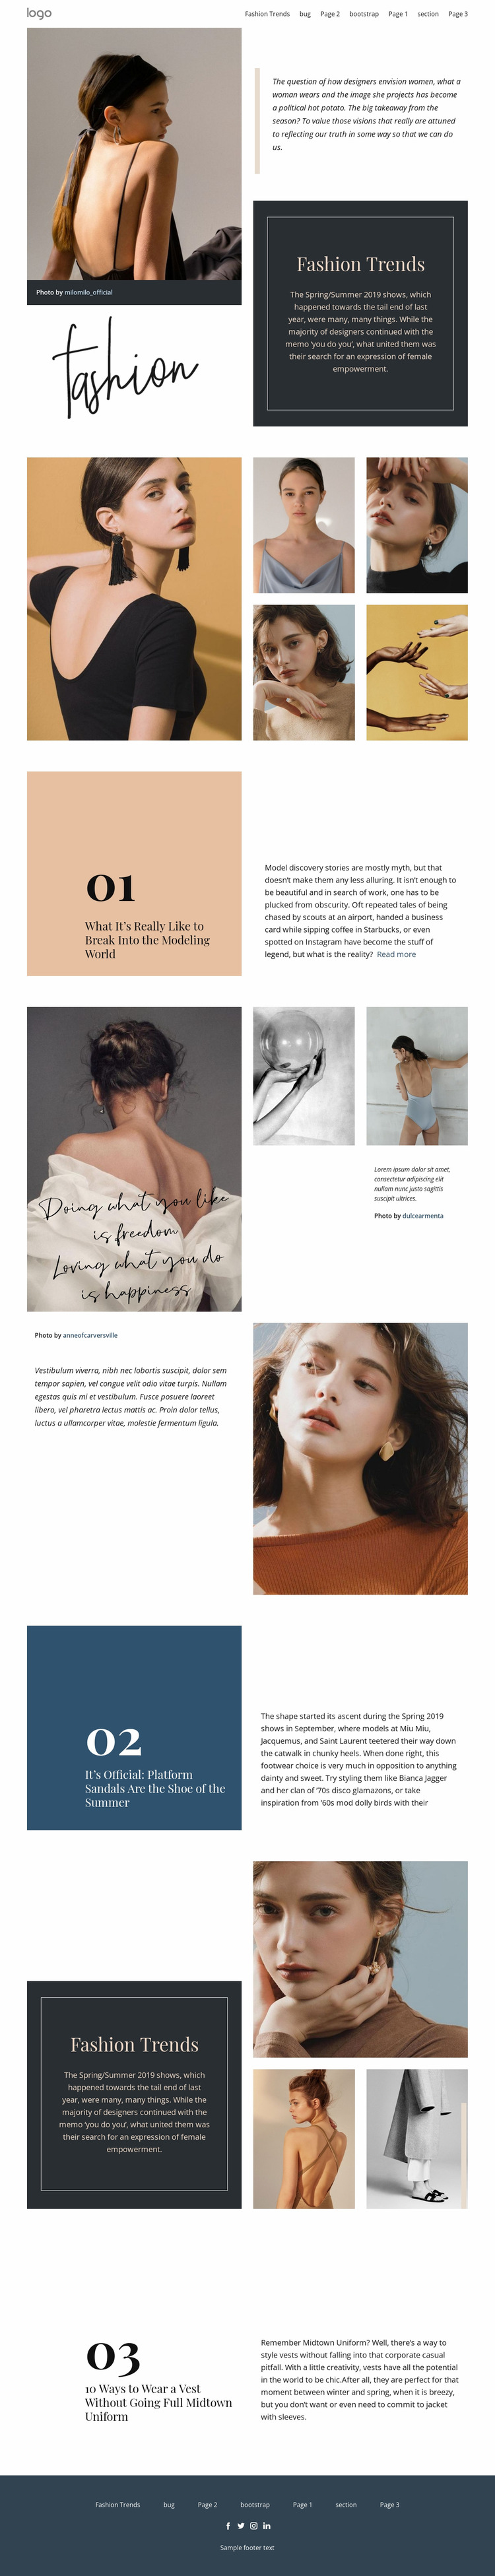 Designer vision of fashion WordPress Website Builder